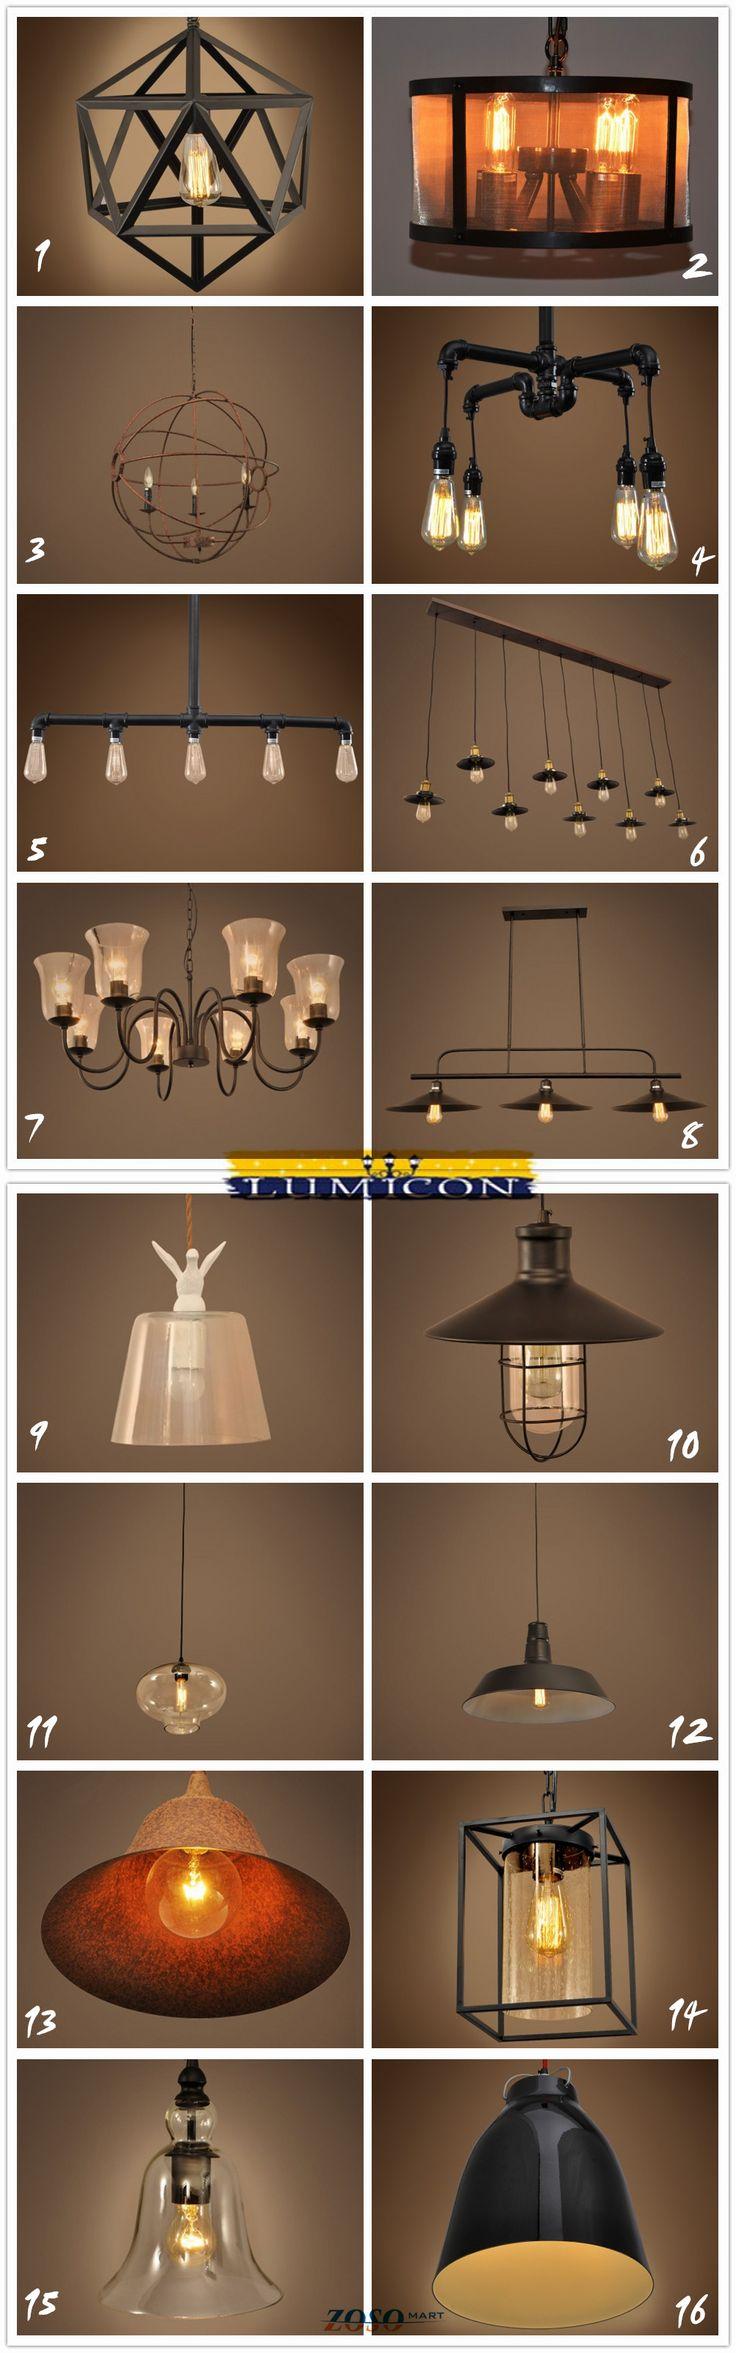 16 most popular lighting fixture. Which one is your favorate? chandeliers, lamps, hanging lighting, pendant lights, industrial lighting, vintage lighting http://www.zosomart.com/home-living/lamps-lighting.html